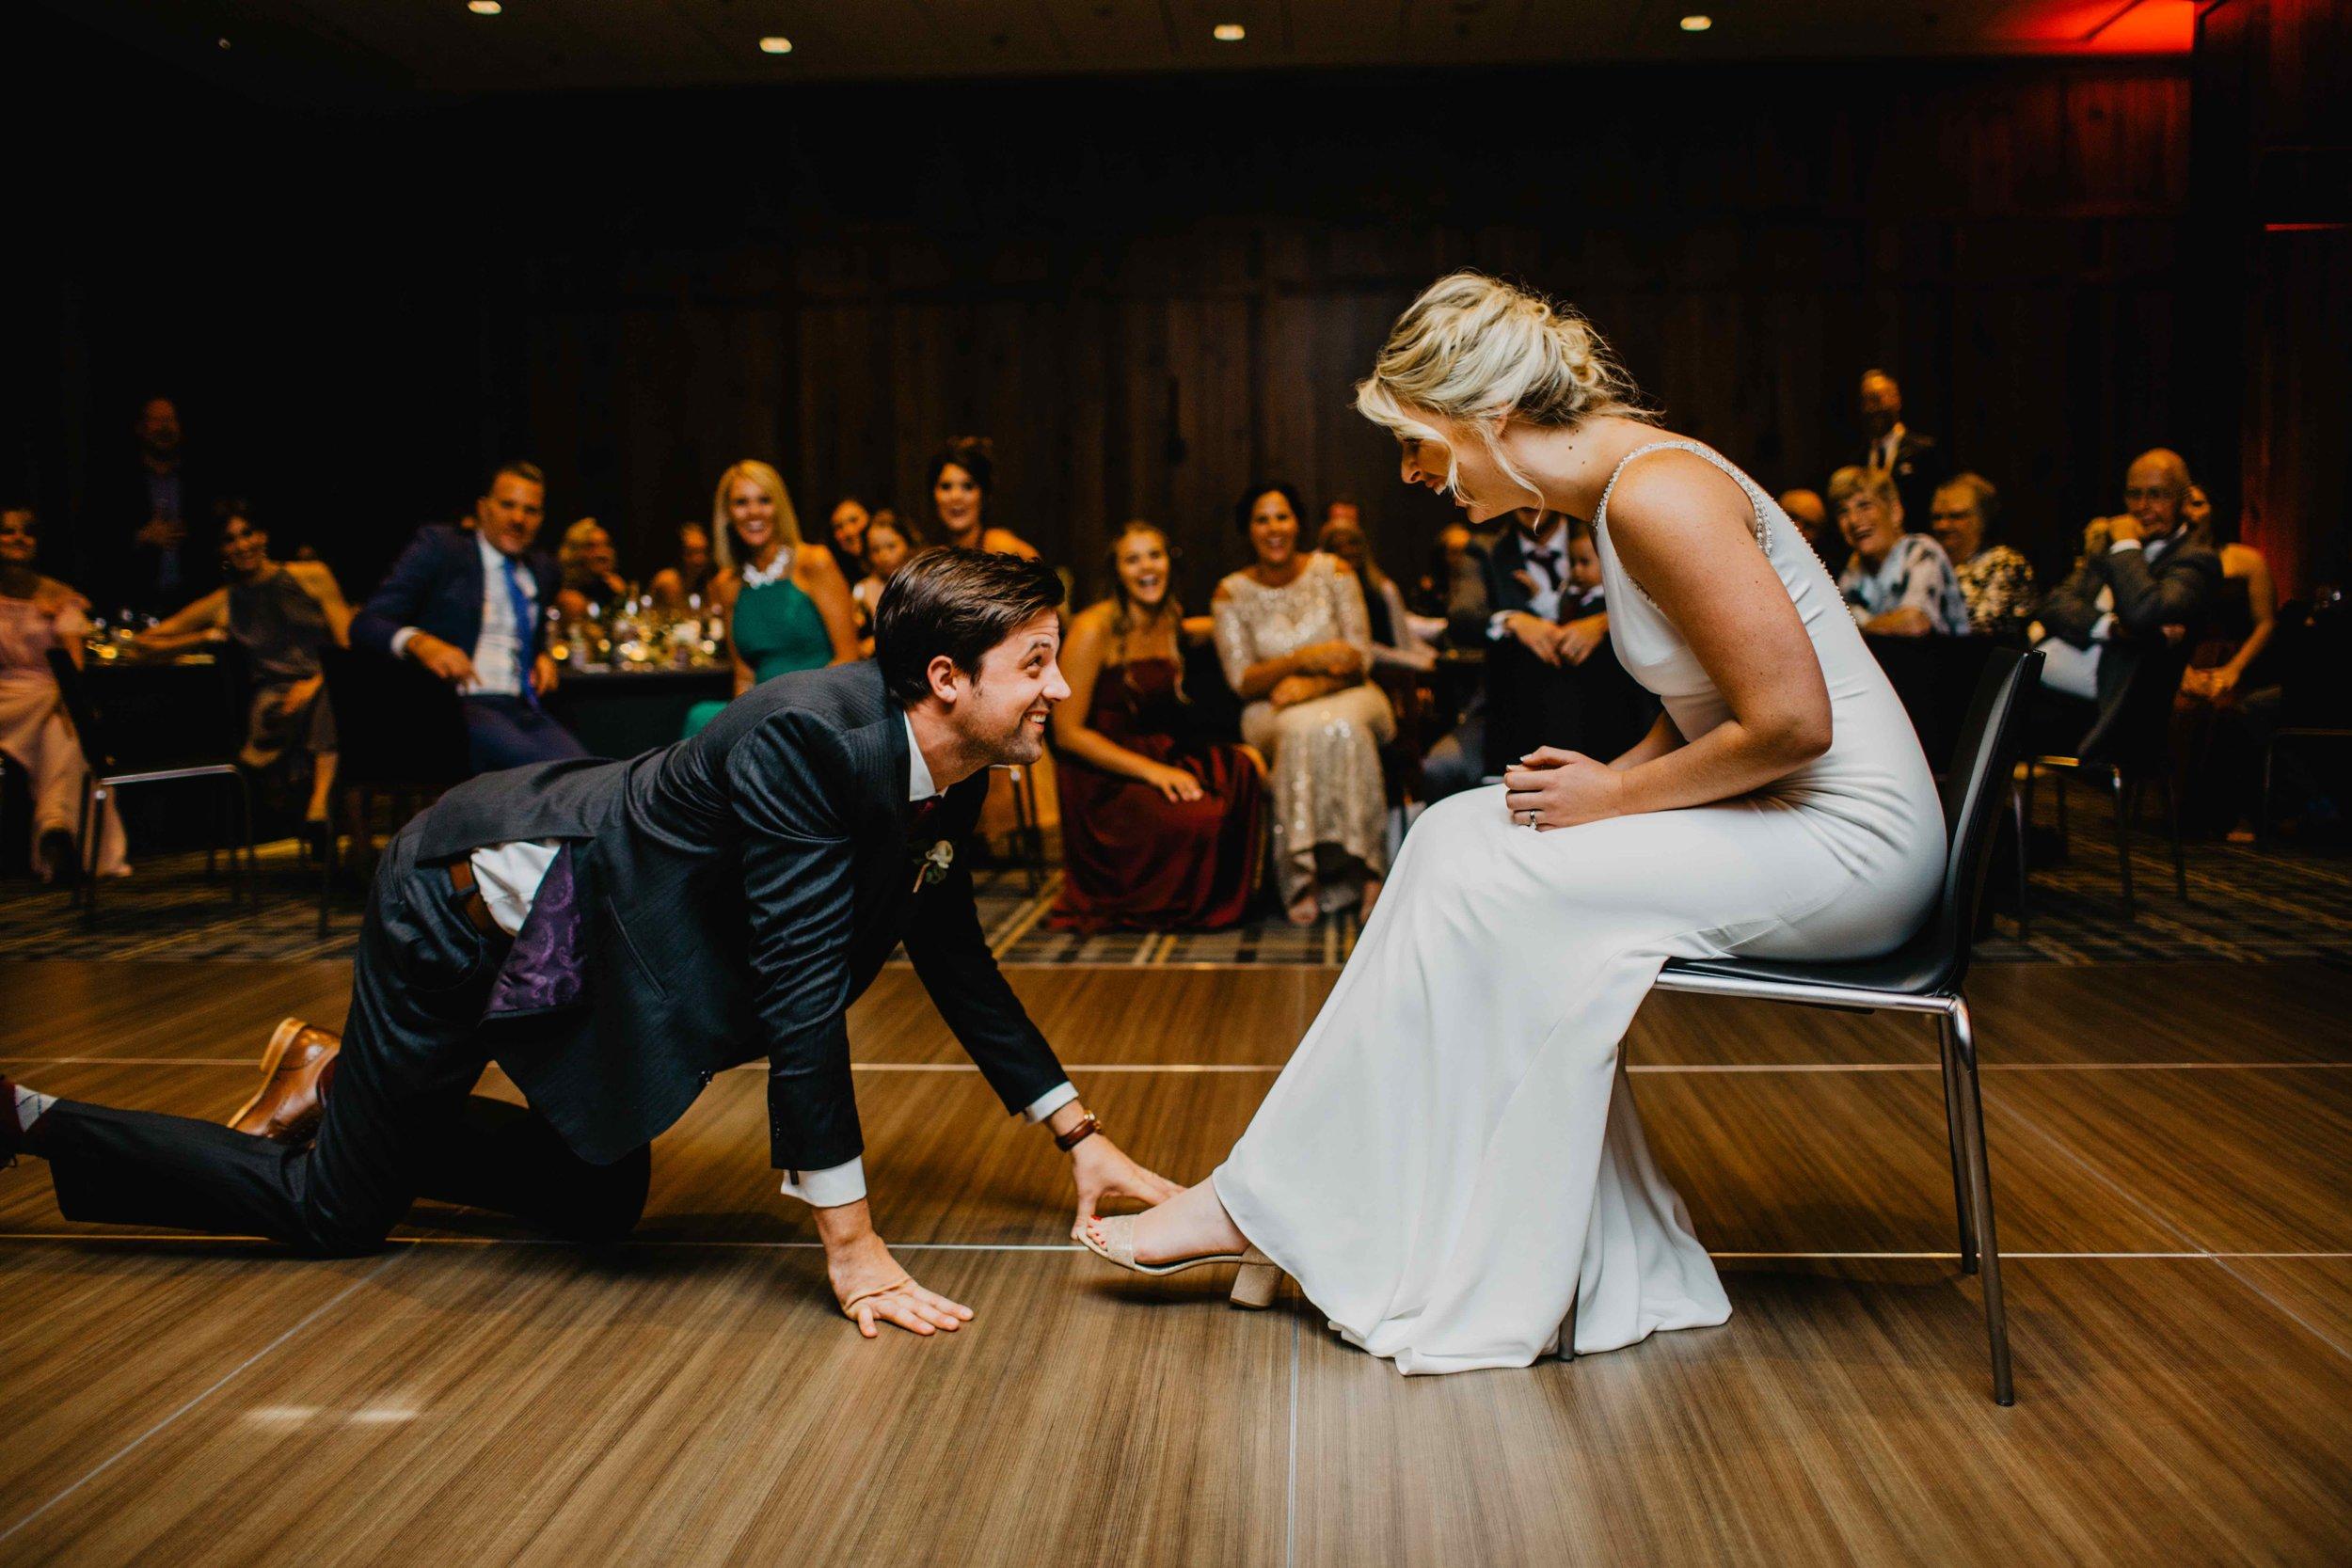 -colorado-springs-wedding-photographer-hotel-born-www.kisaconrad.com-16876.jpg